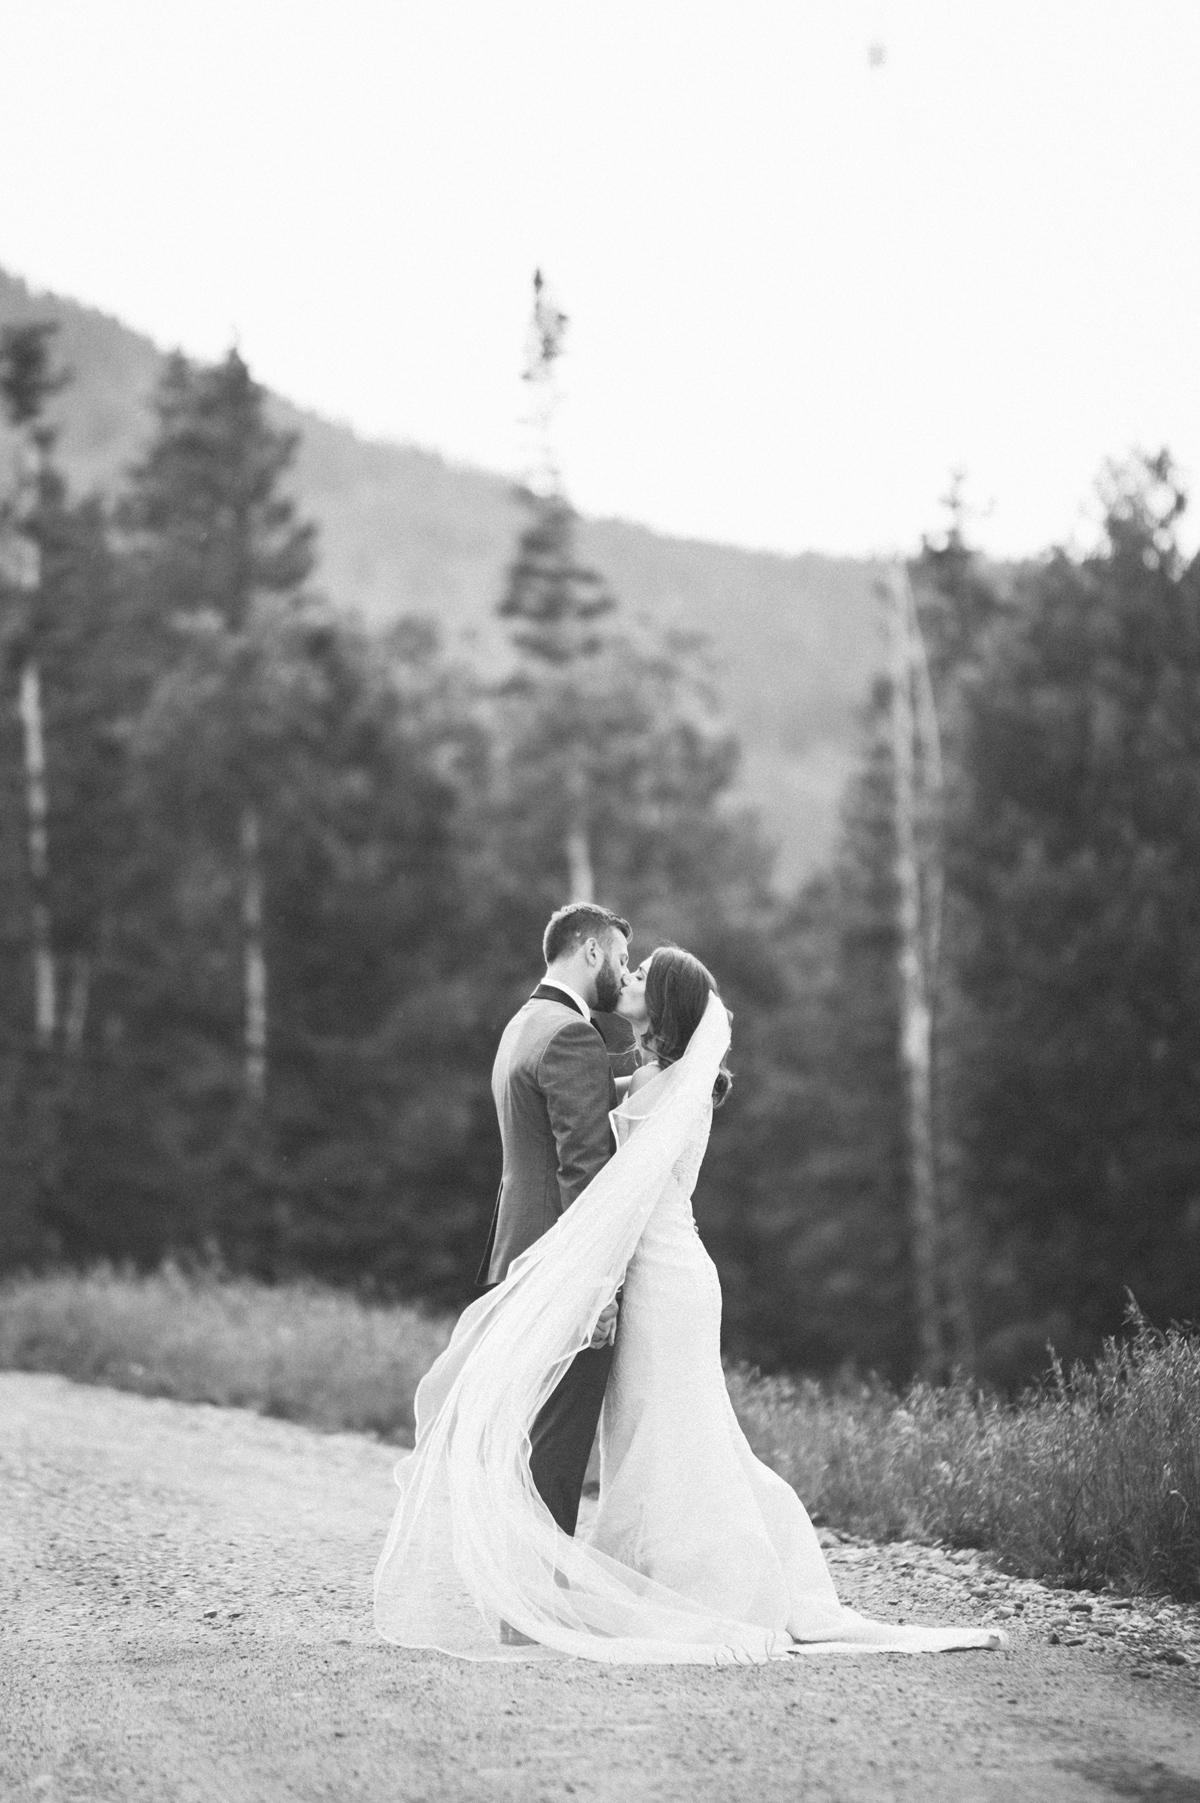 377-beaver-creek--couple--portrait--mountain-top--black-and-white--kiss.jpg